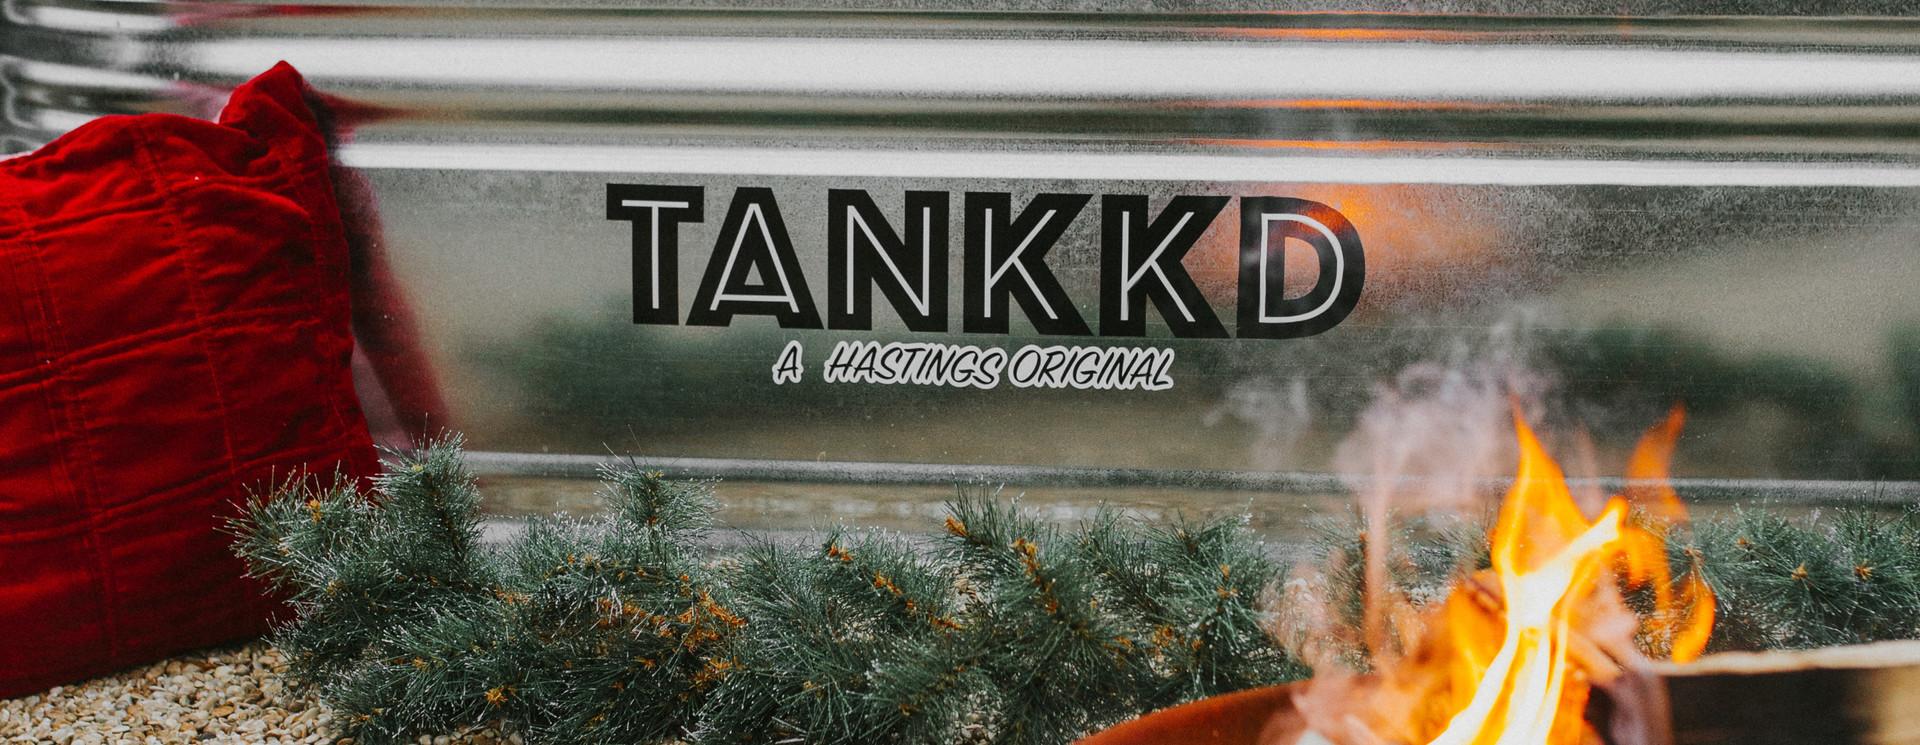 Tankkd / Hastings Réservoirs ovales Black Label